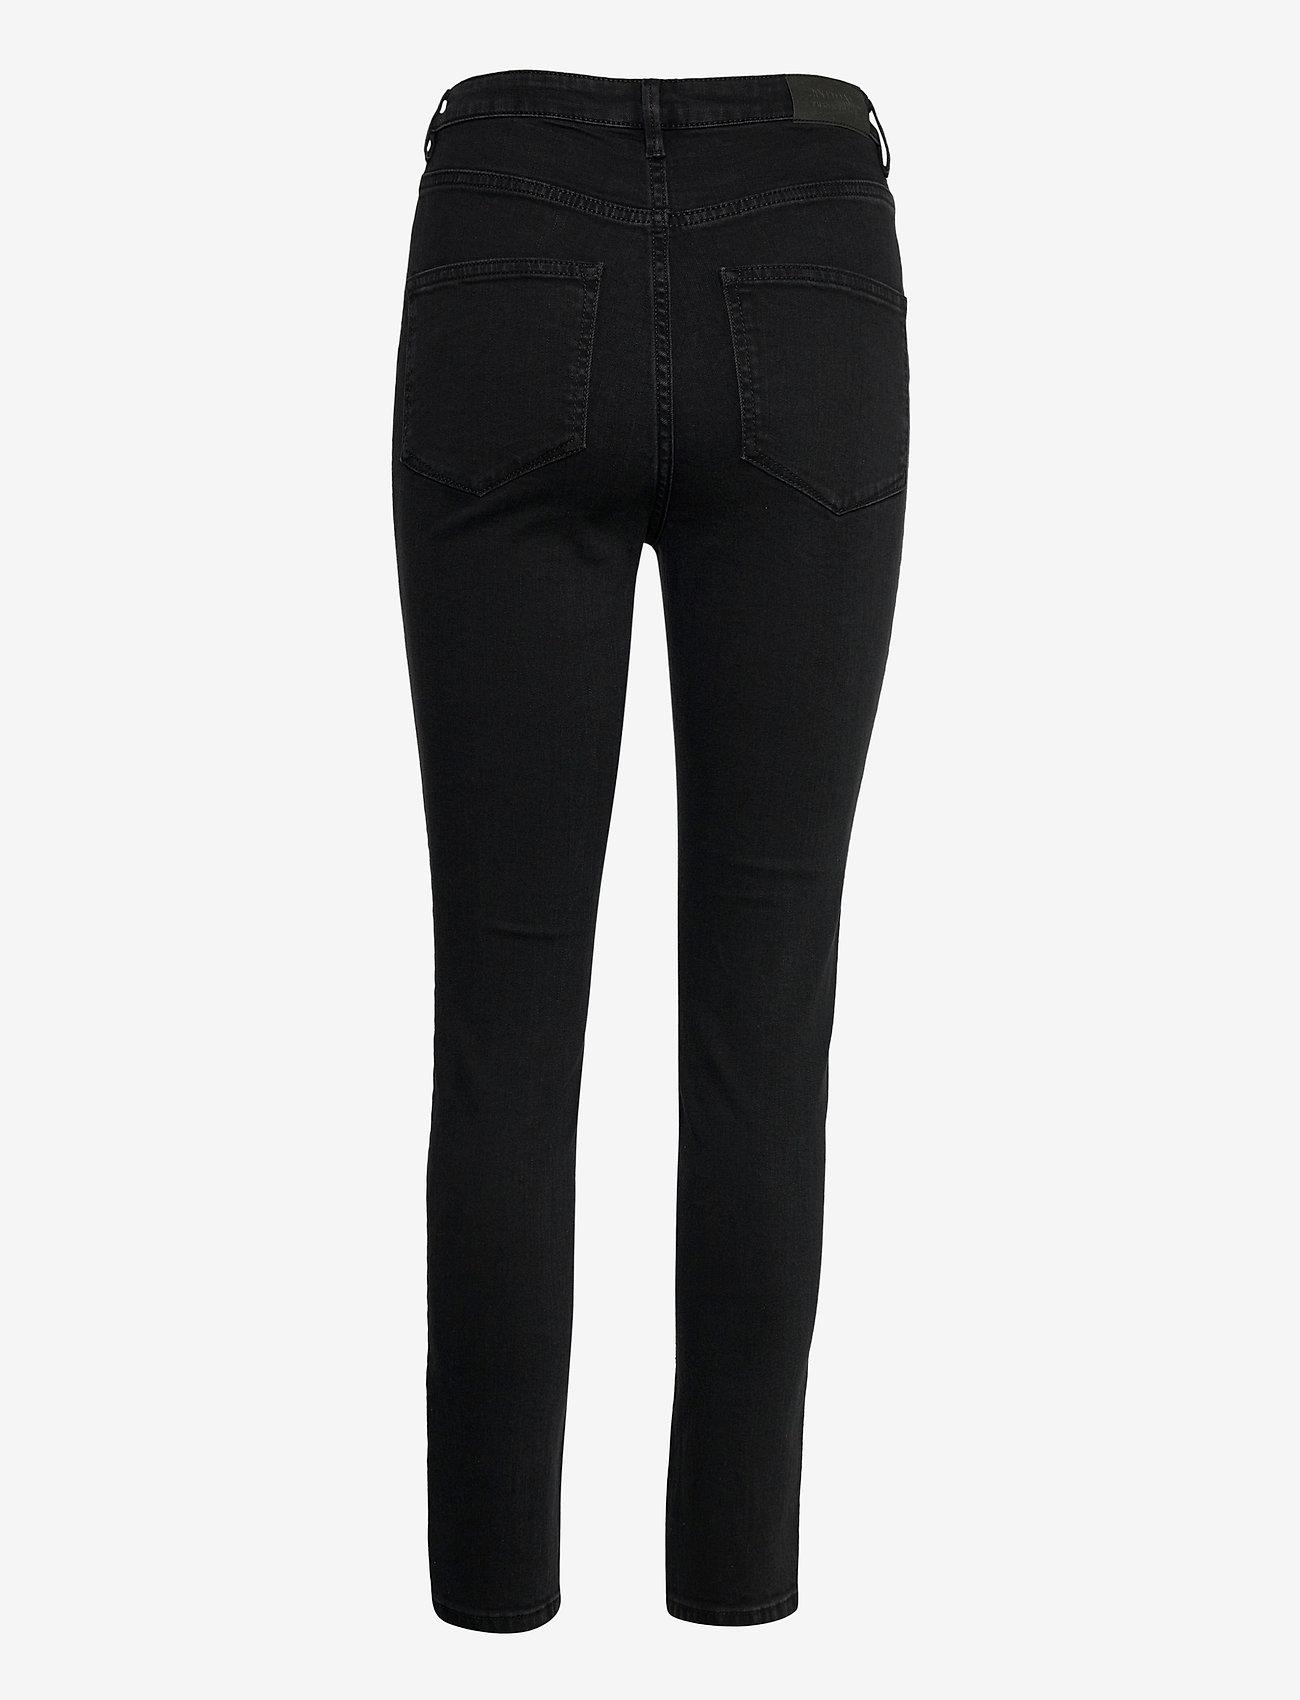 2NDDAY - 2ND Sadie Cropped ThinkTwice - skinny jeans - black denim - 1